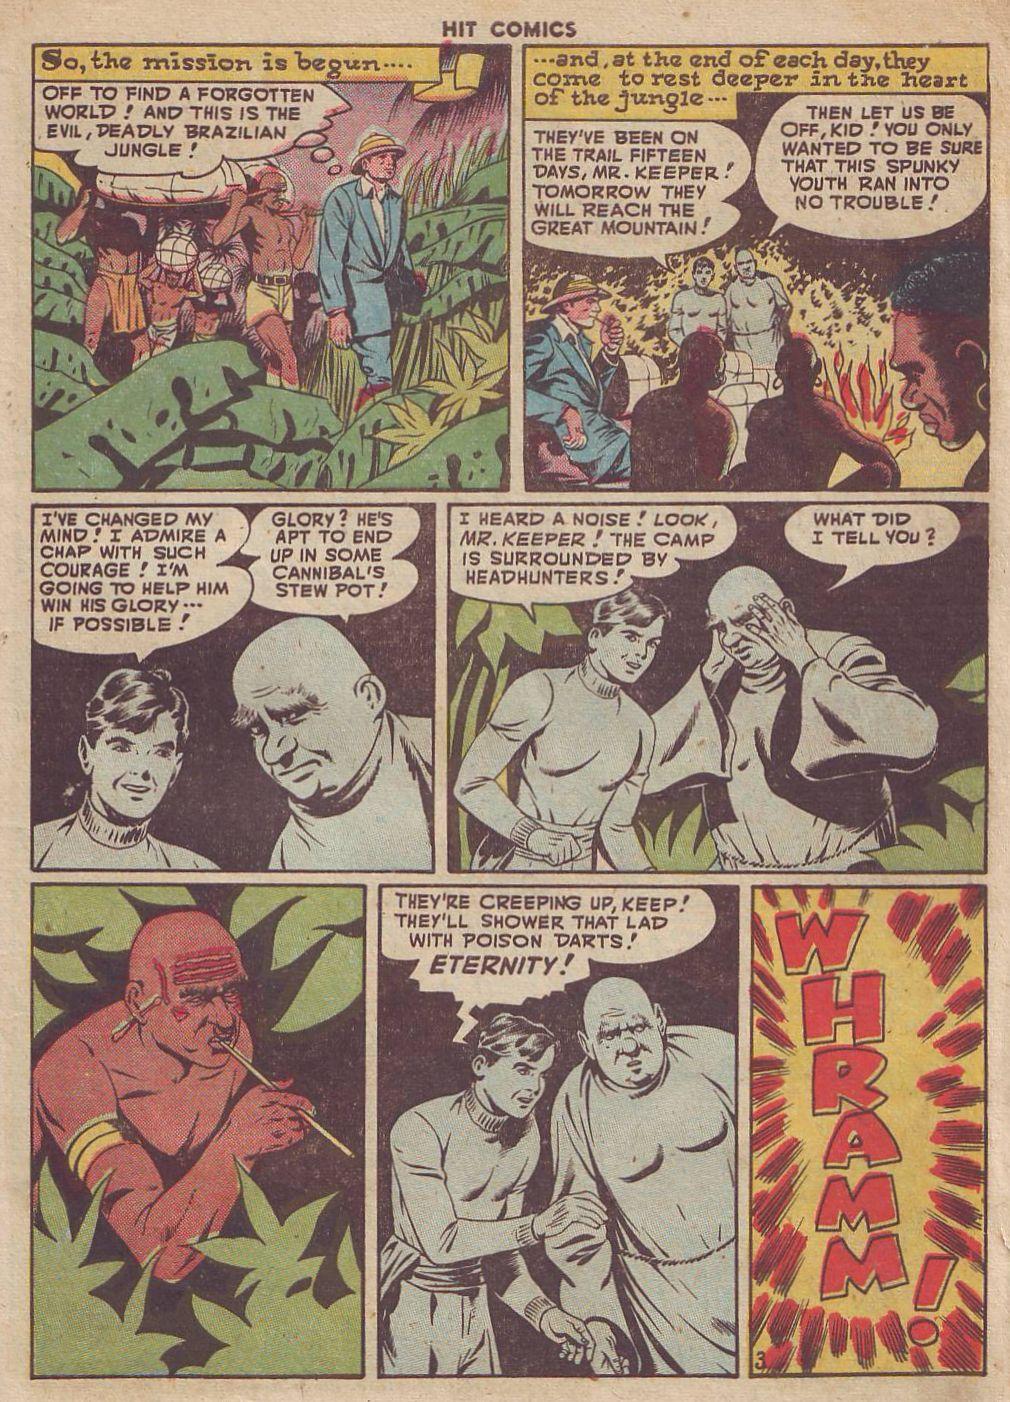 Read online Hit Comics comic -  Issue #51 - 5